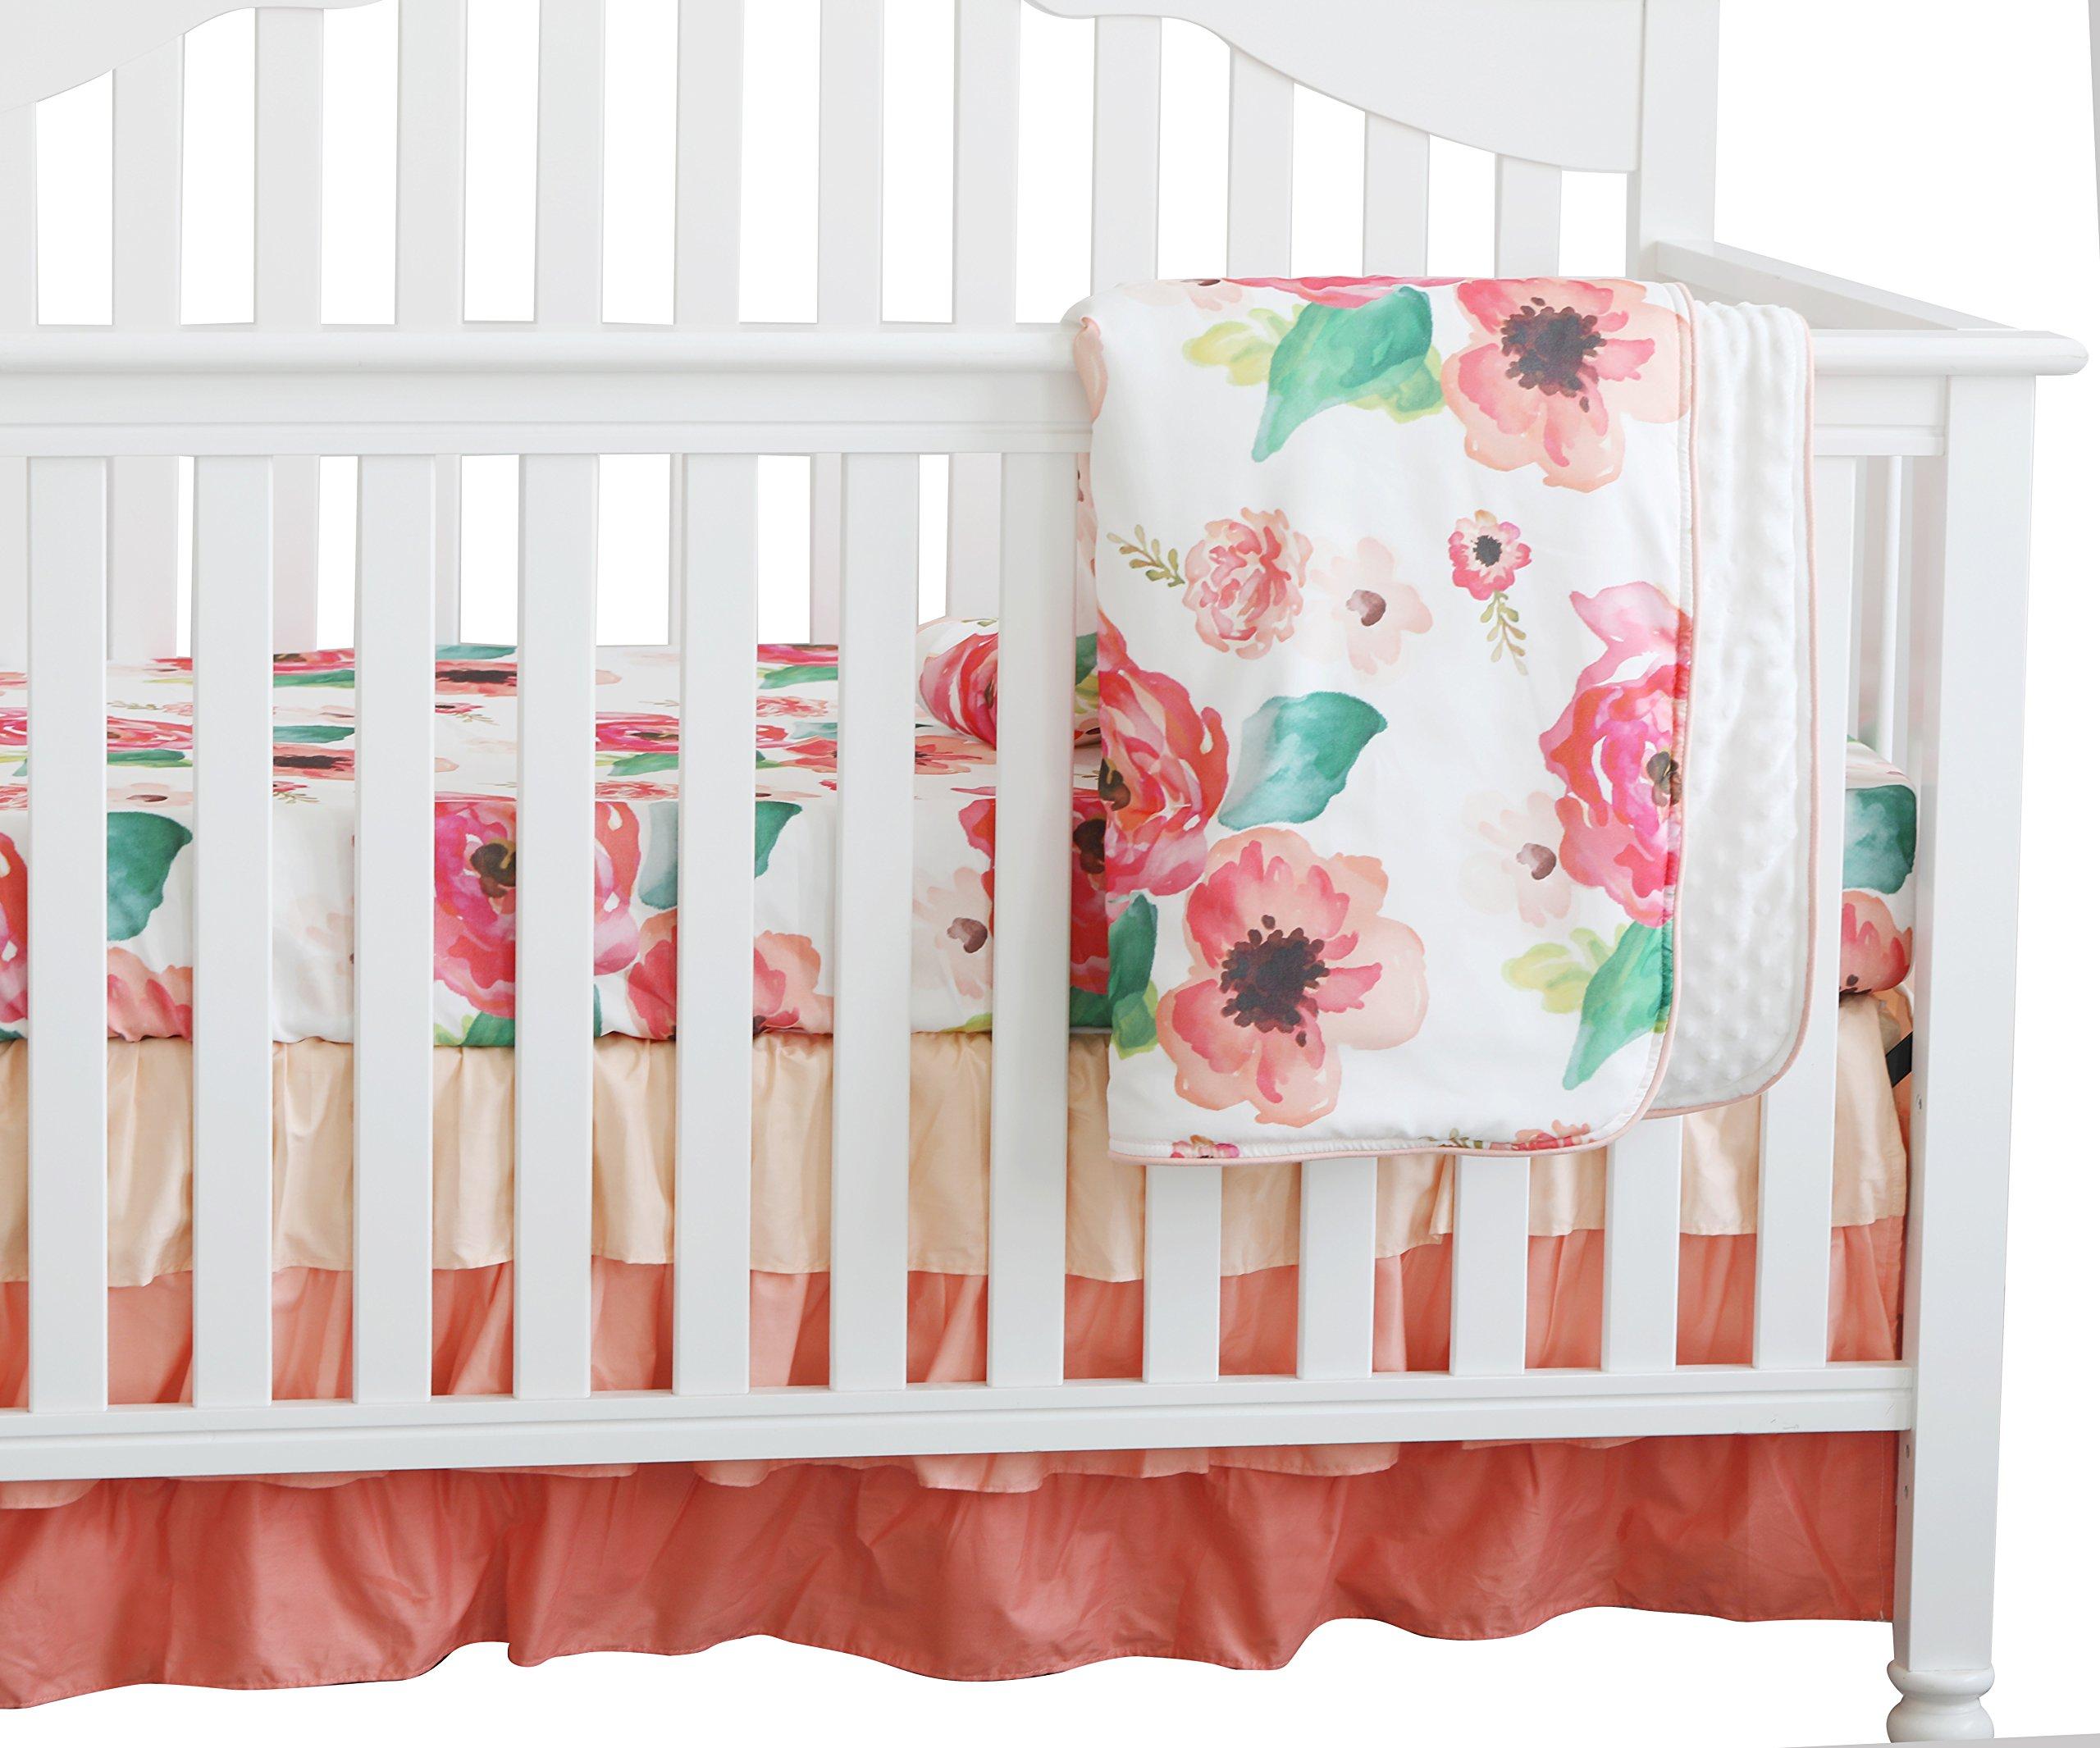 3 pcs Set Boho Floral Ruffle Baby Minky Blanket Water Color, Peach Floral Nursery Crib Skirt Set Baby Girl Crib Bedding (Coral)